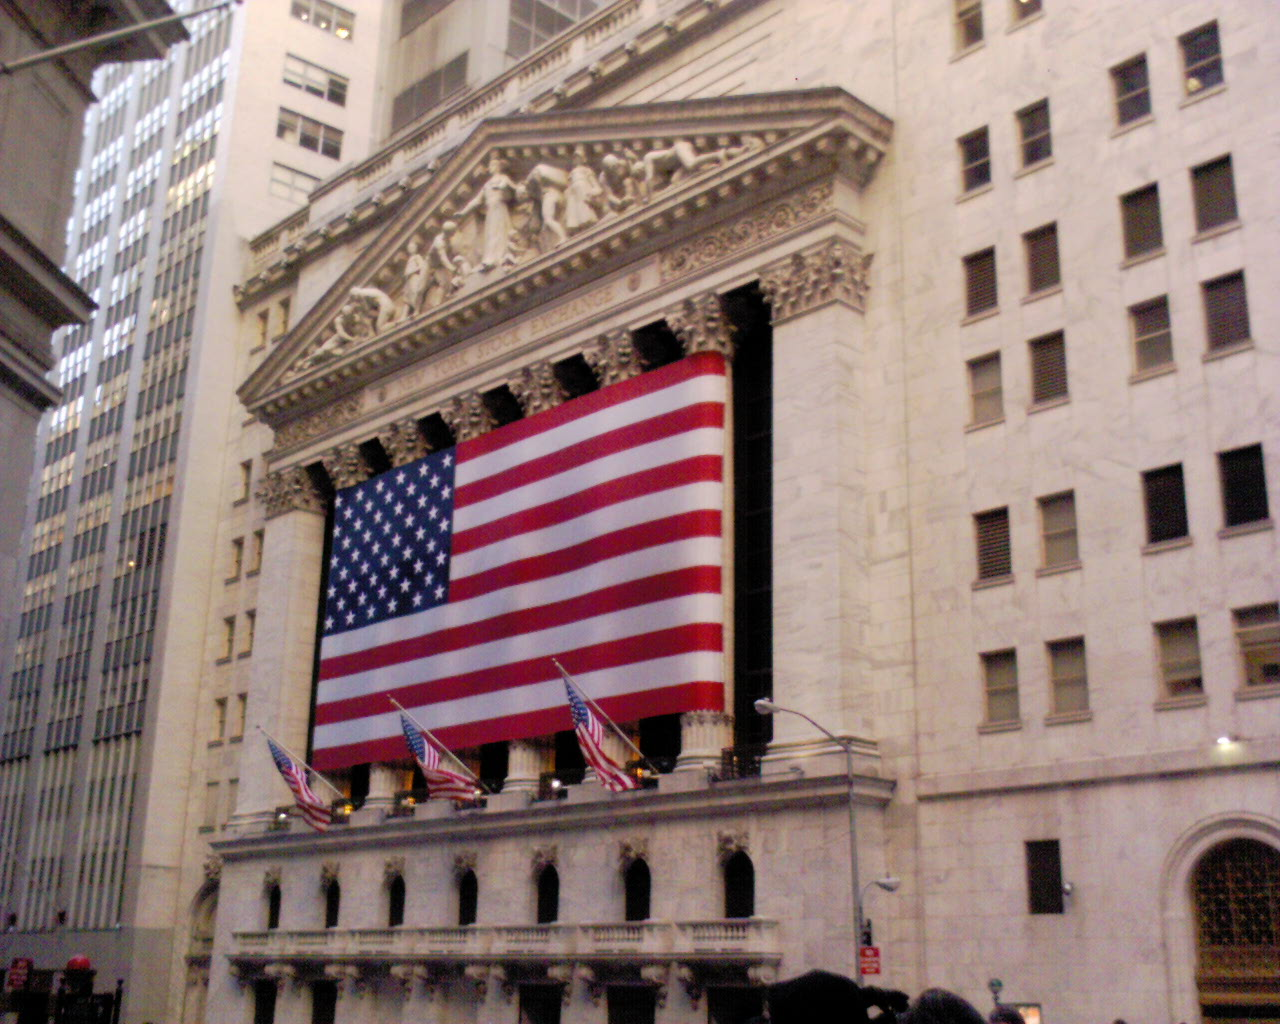 U.S. Stock ETFs Dip Ahead of Trump's Swearing-in